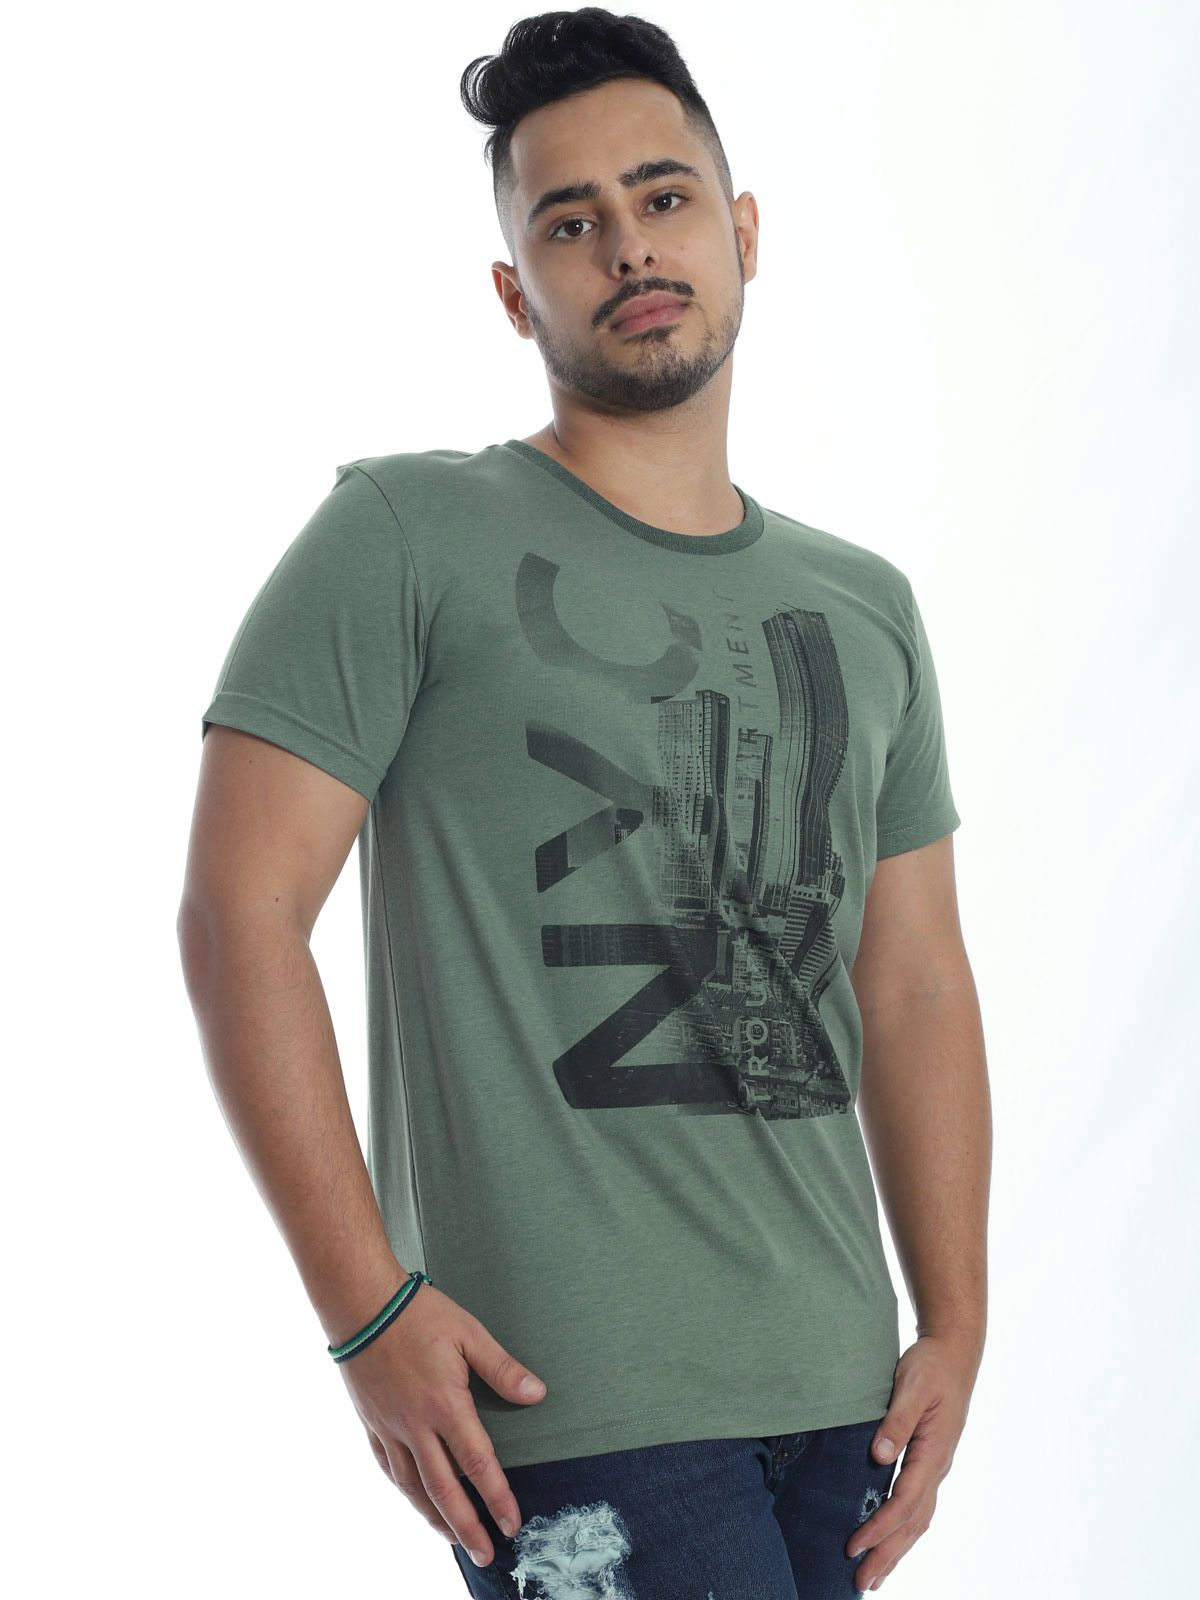 Camiseta Anistia Básica Stoned Militar